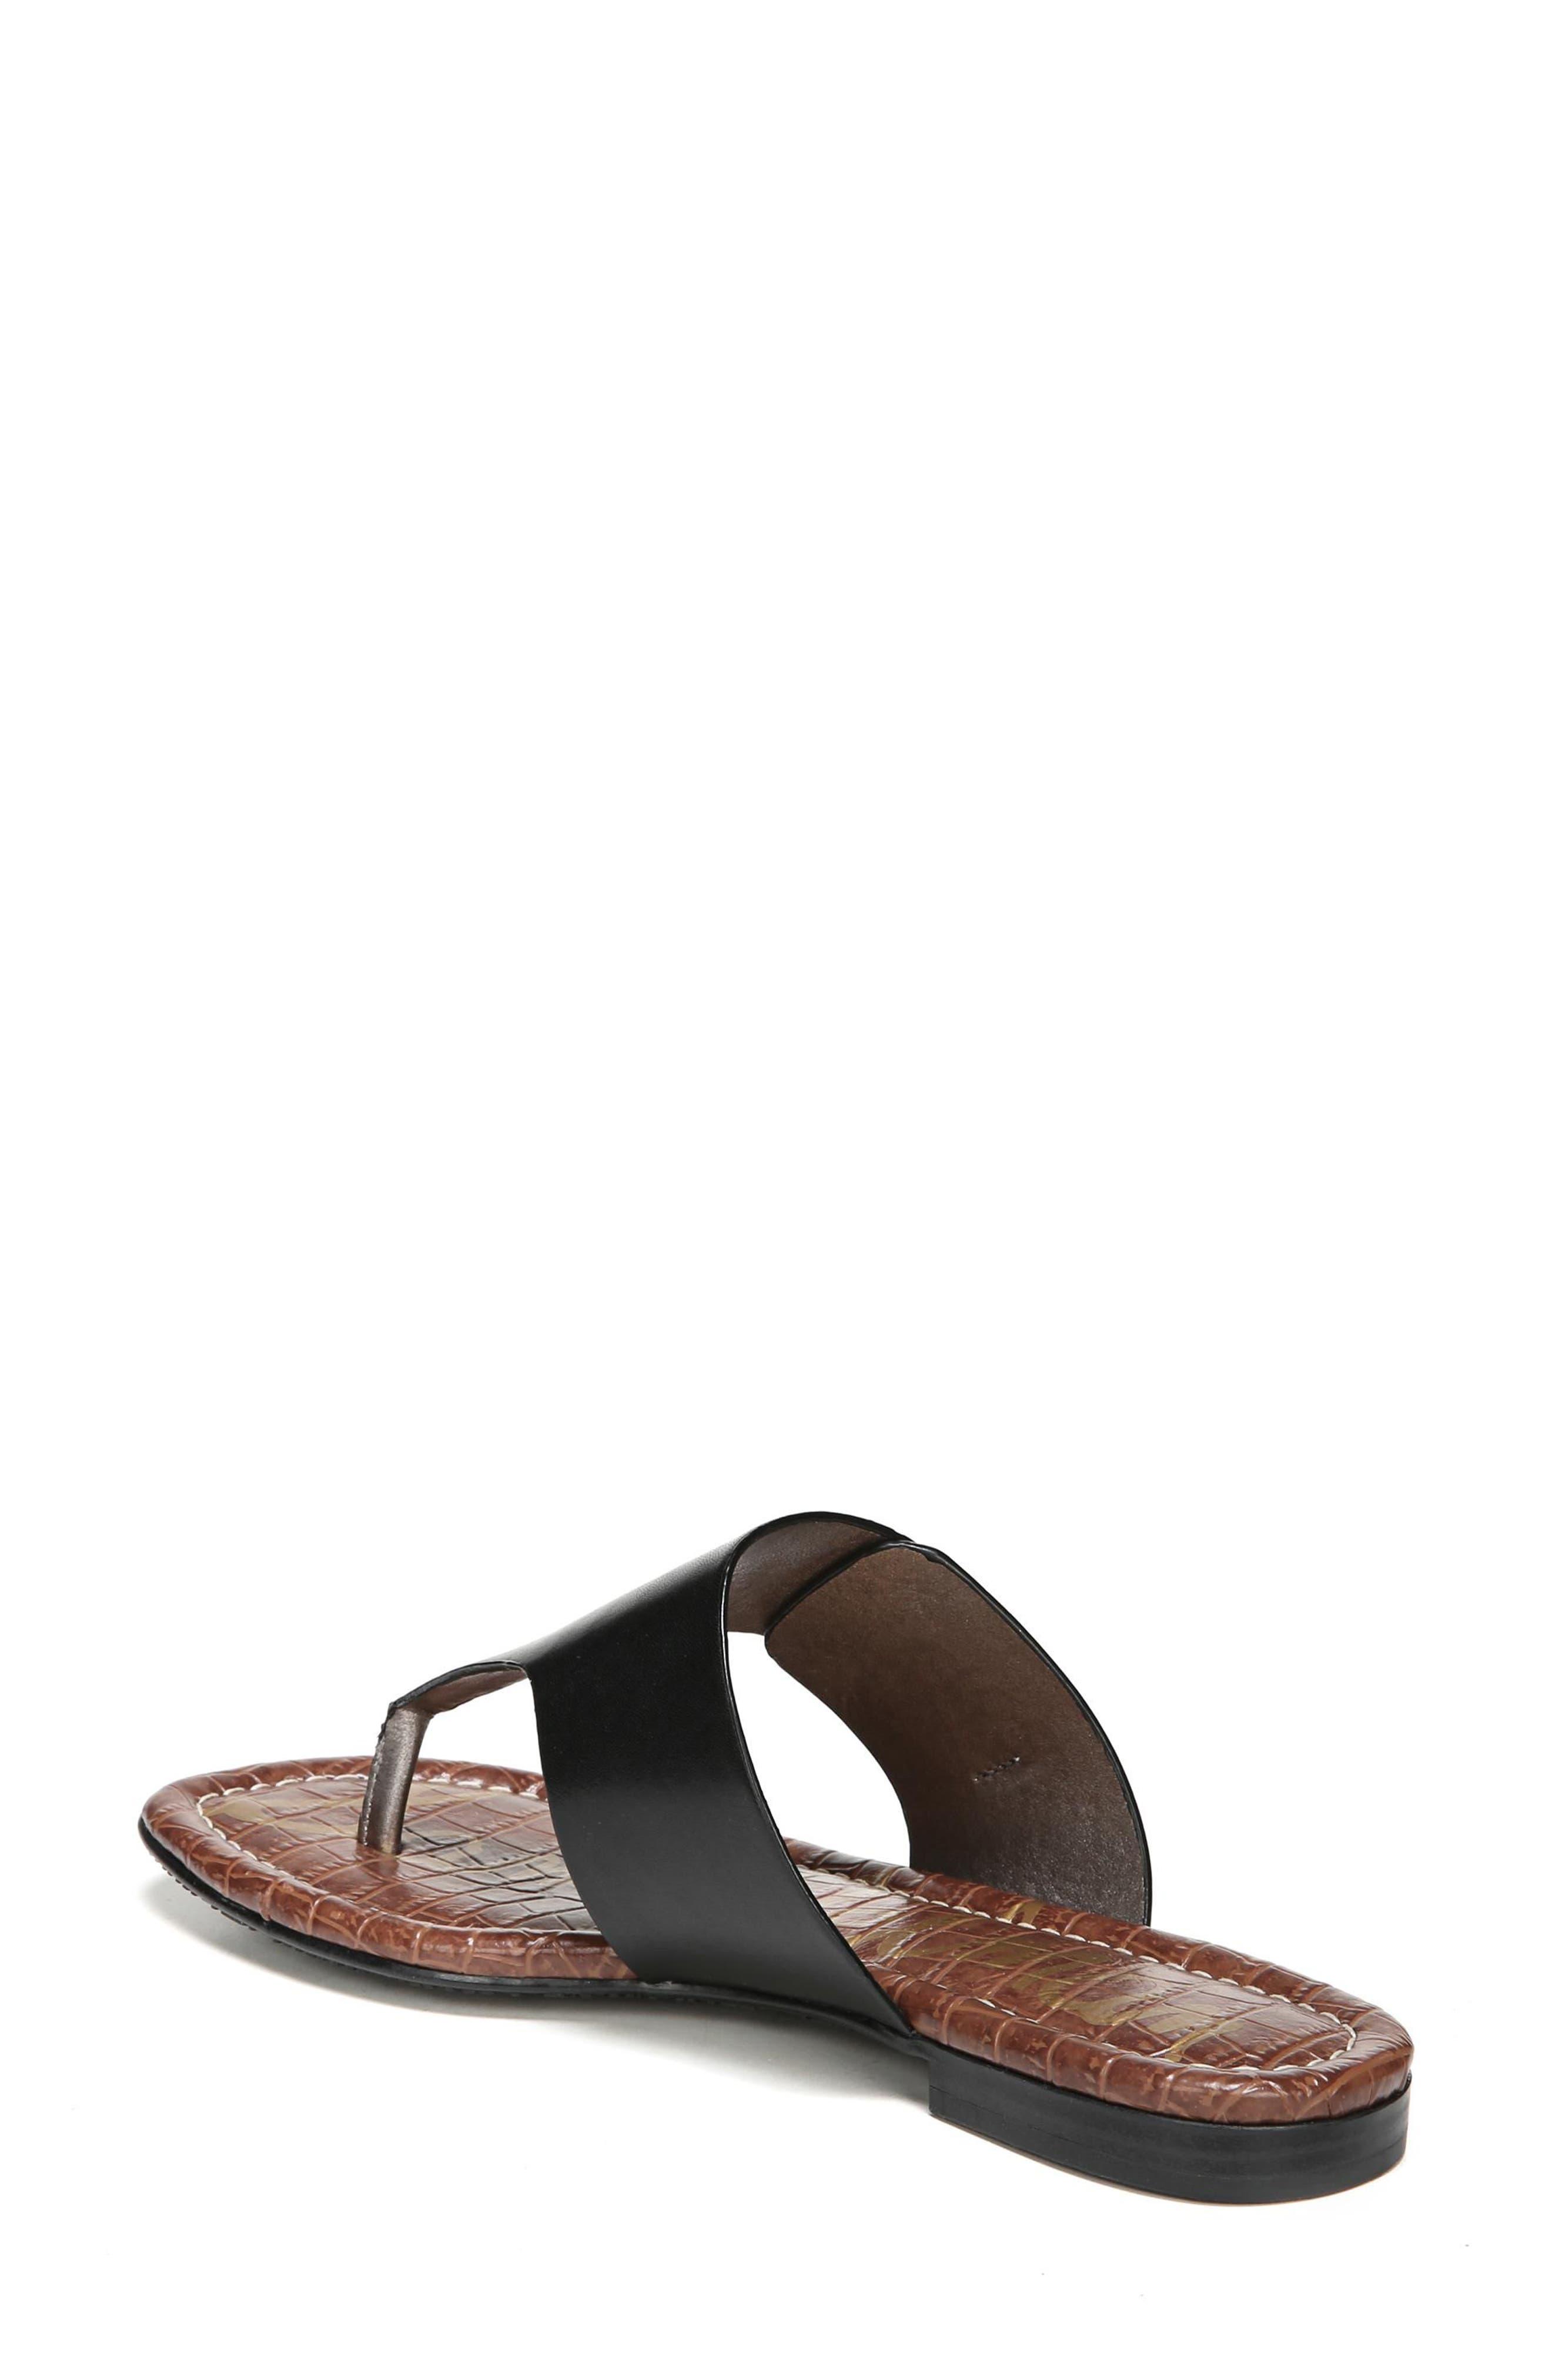 Barry V-Strap Thong Sandal,                             Alternate thumbnail 2, color,                             Black Leather